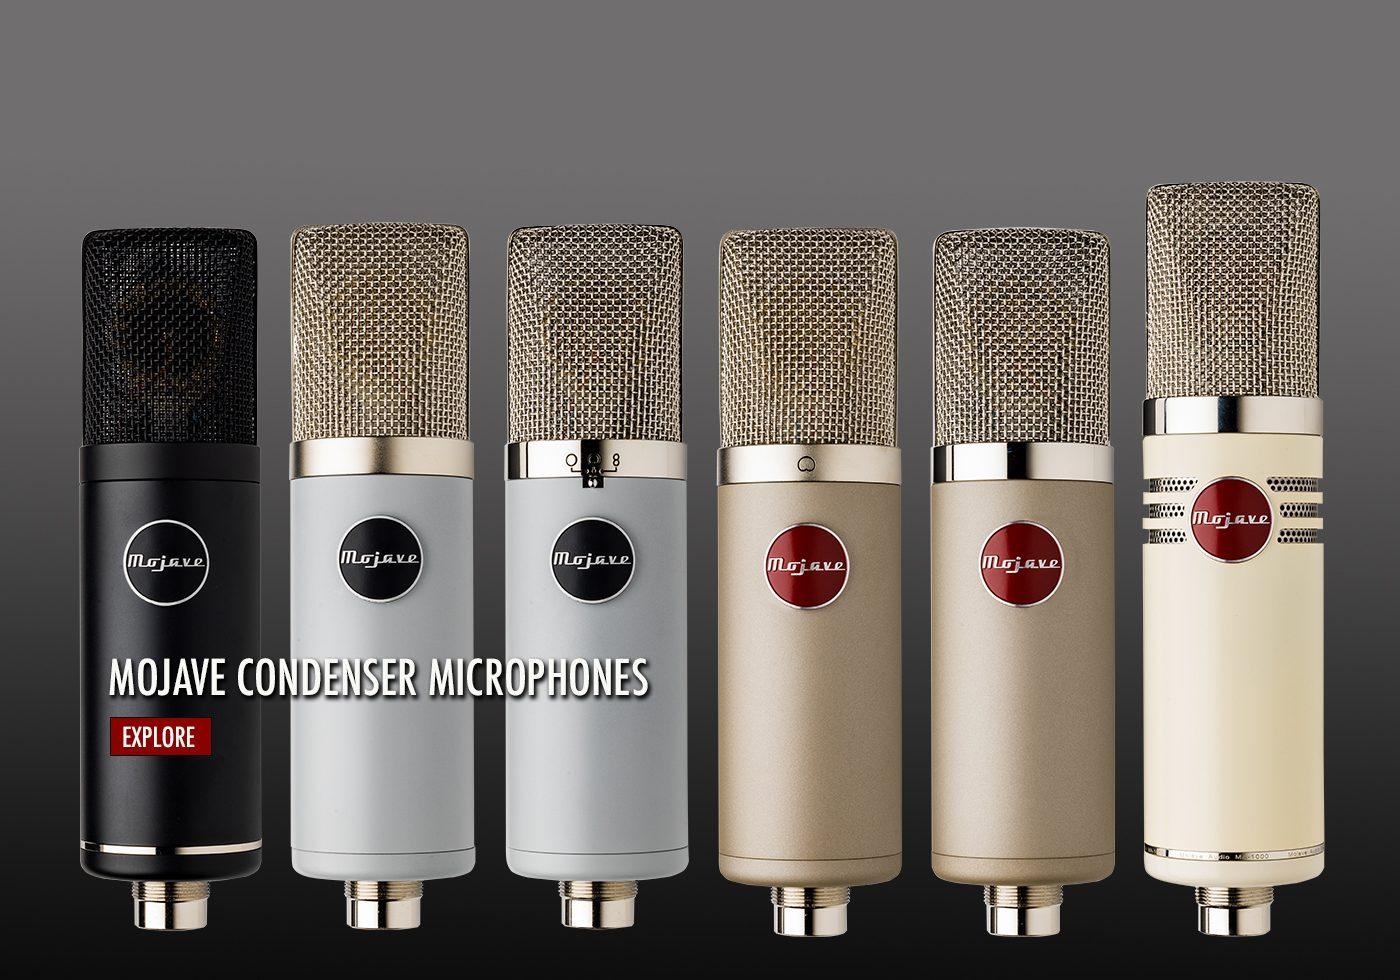 Mojave Condenser Microphones